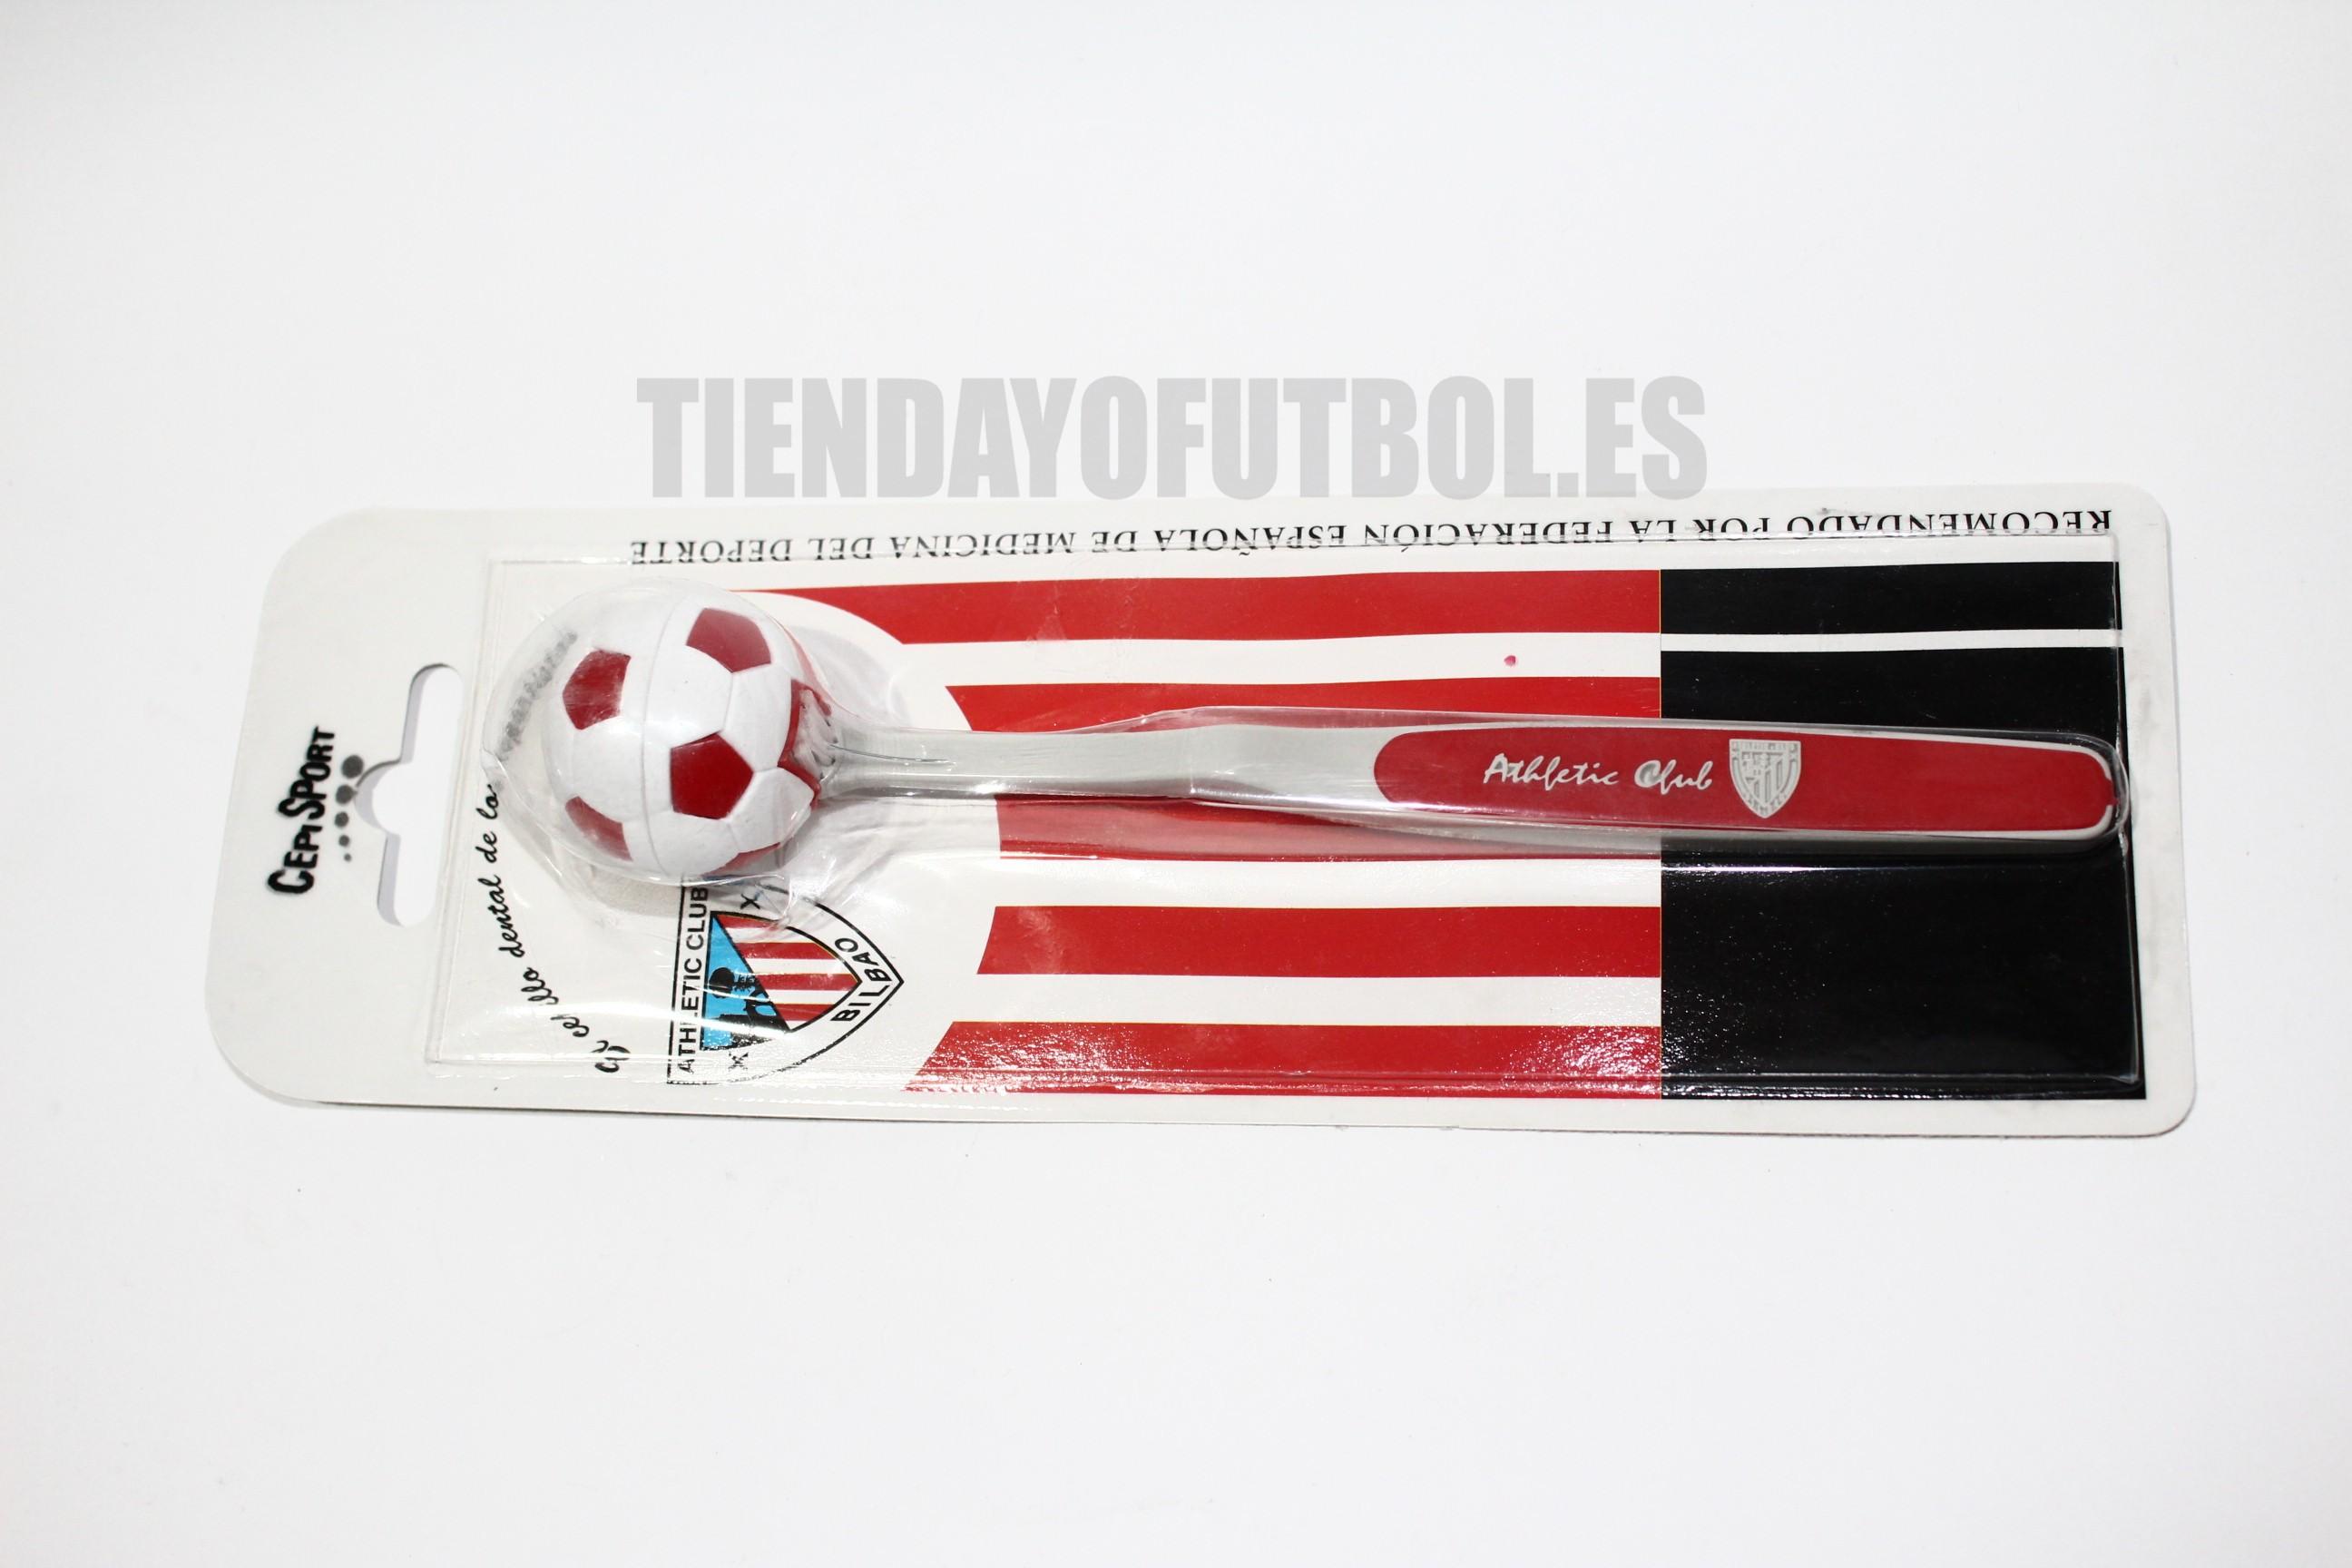 Cepillo de dientes Athletic Club de Bilbao  a758e931f5c5